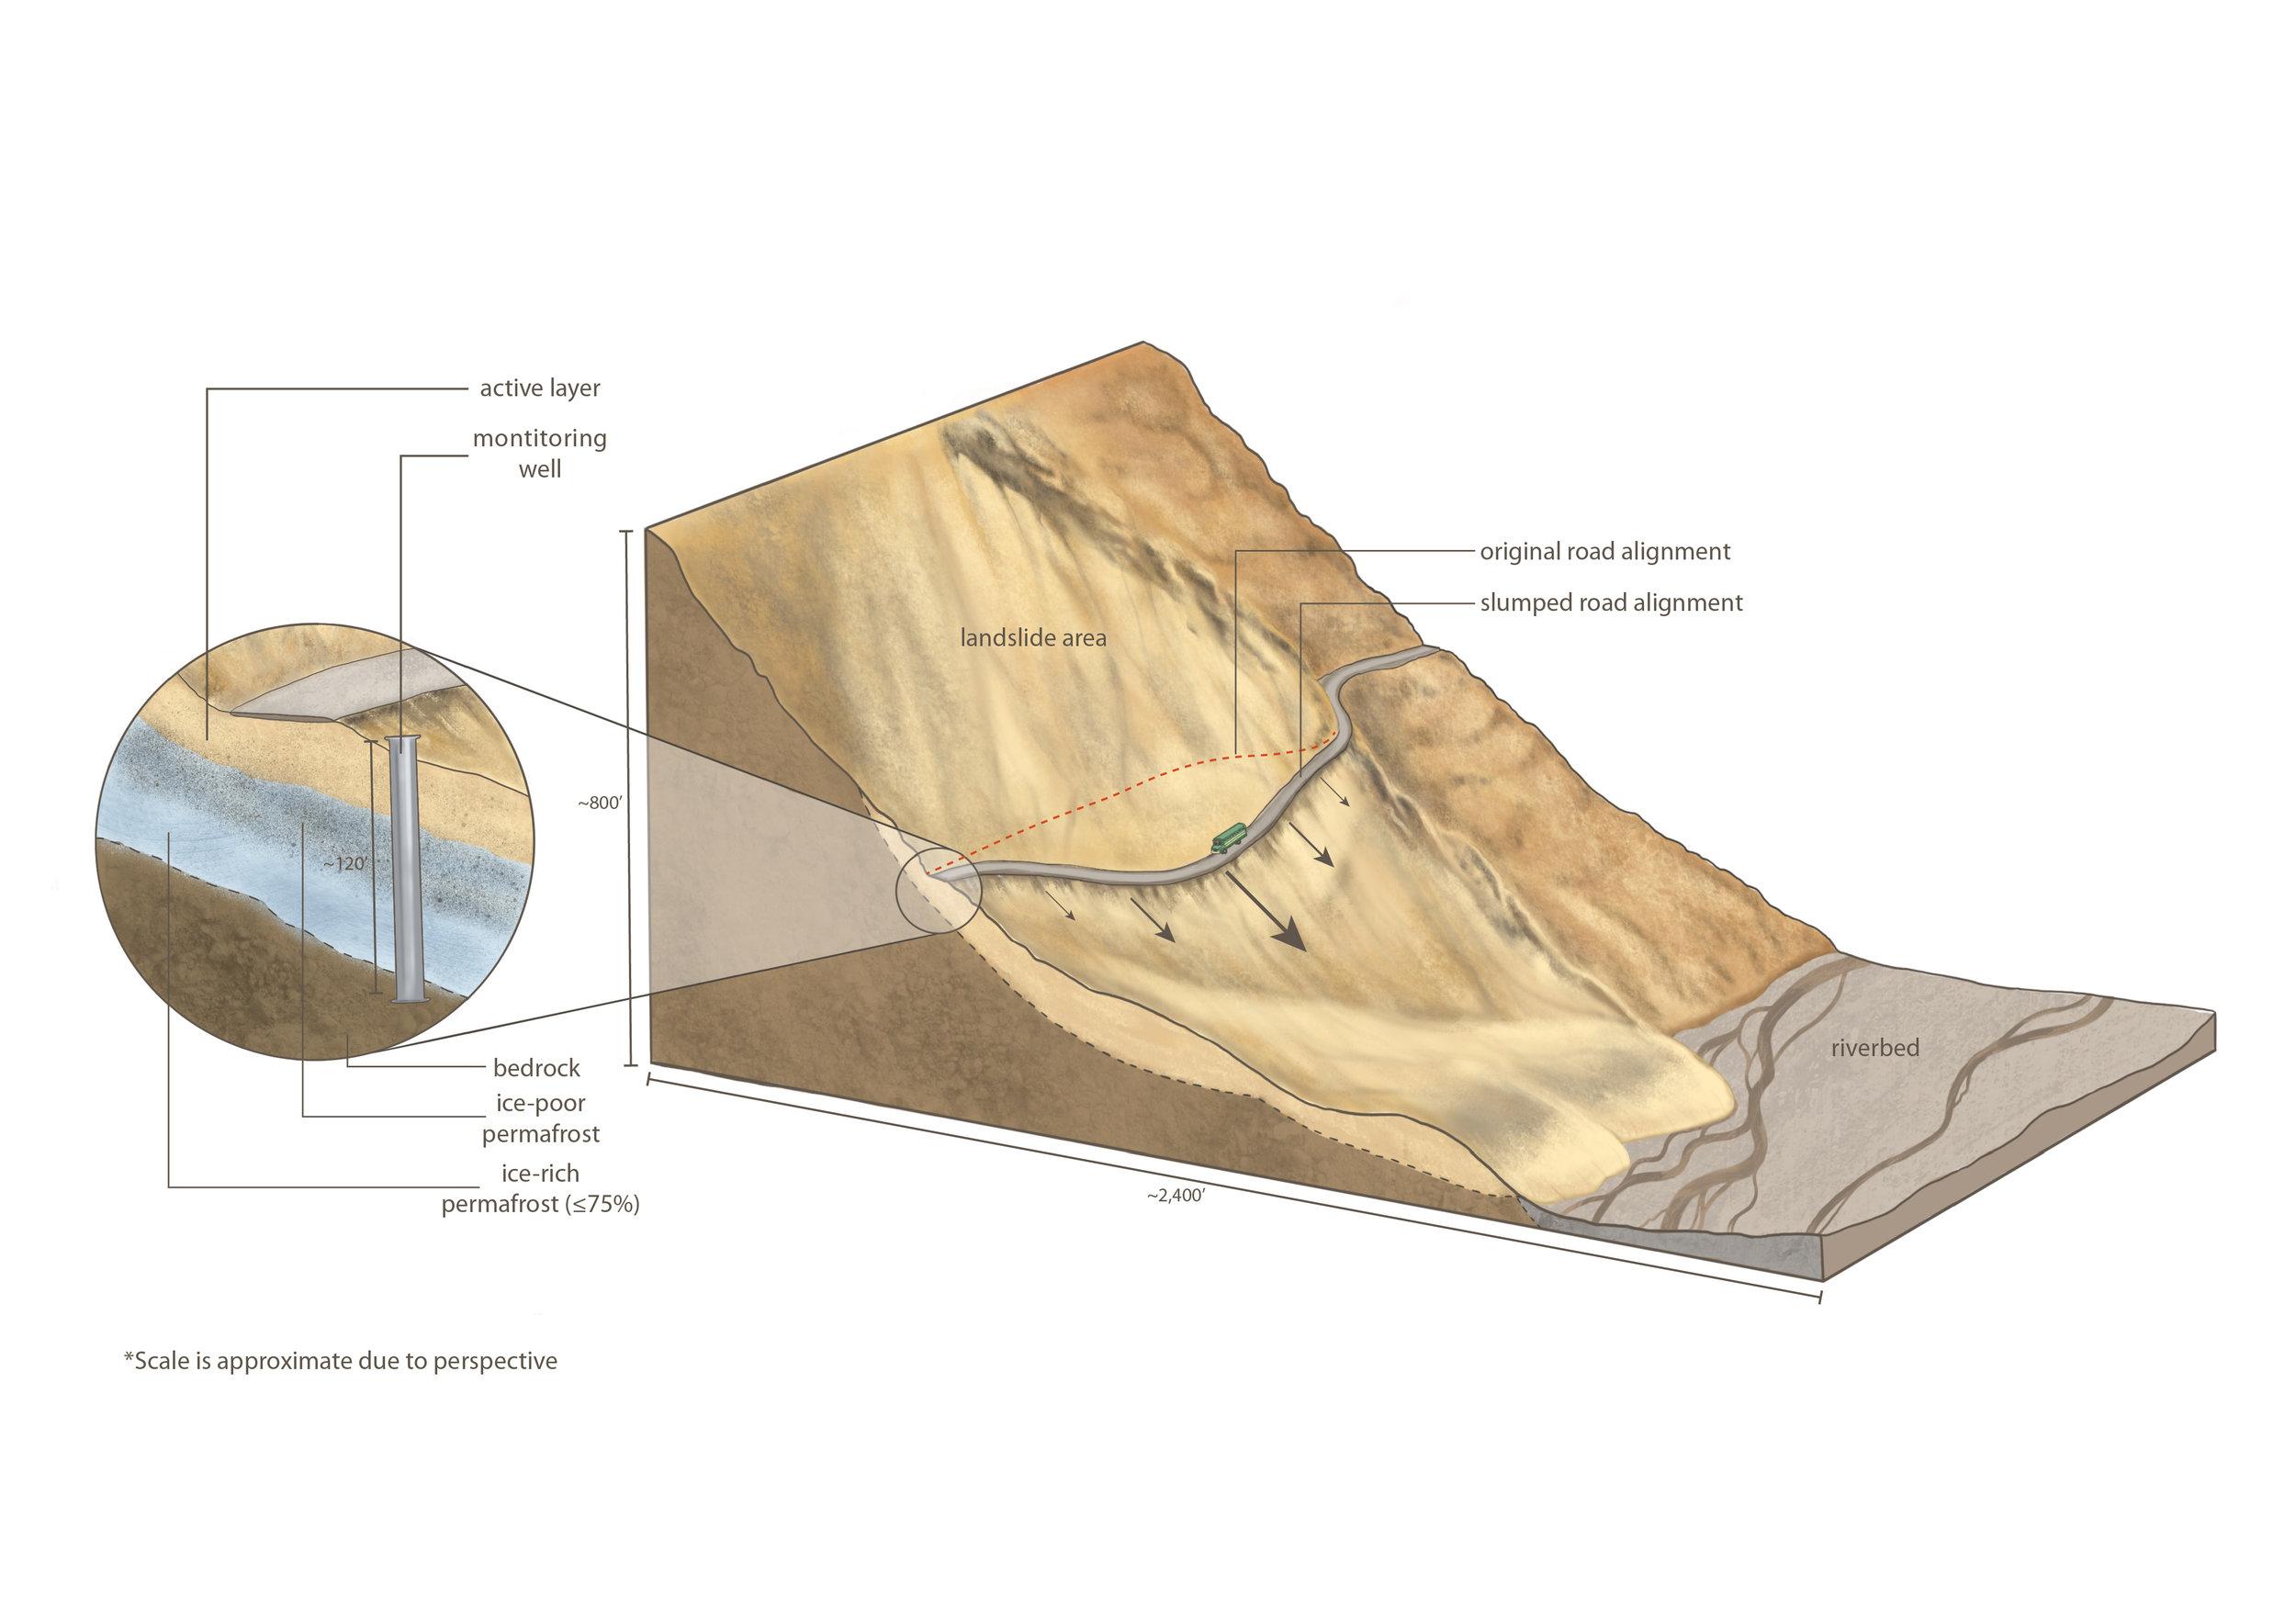 Polychrome Basin Pretty Rocks Landslide